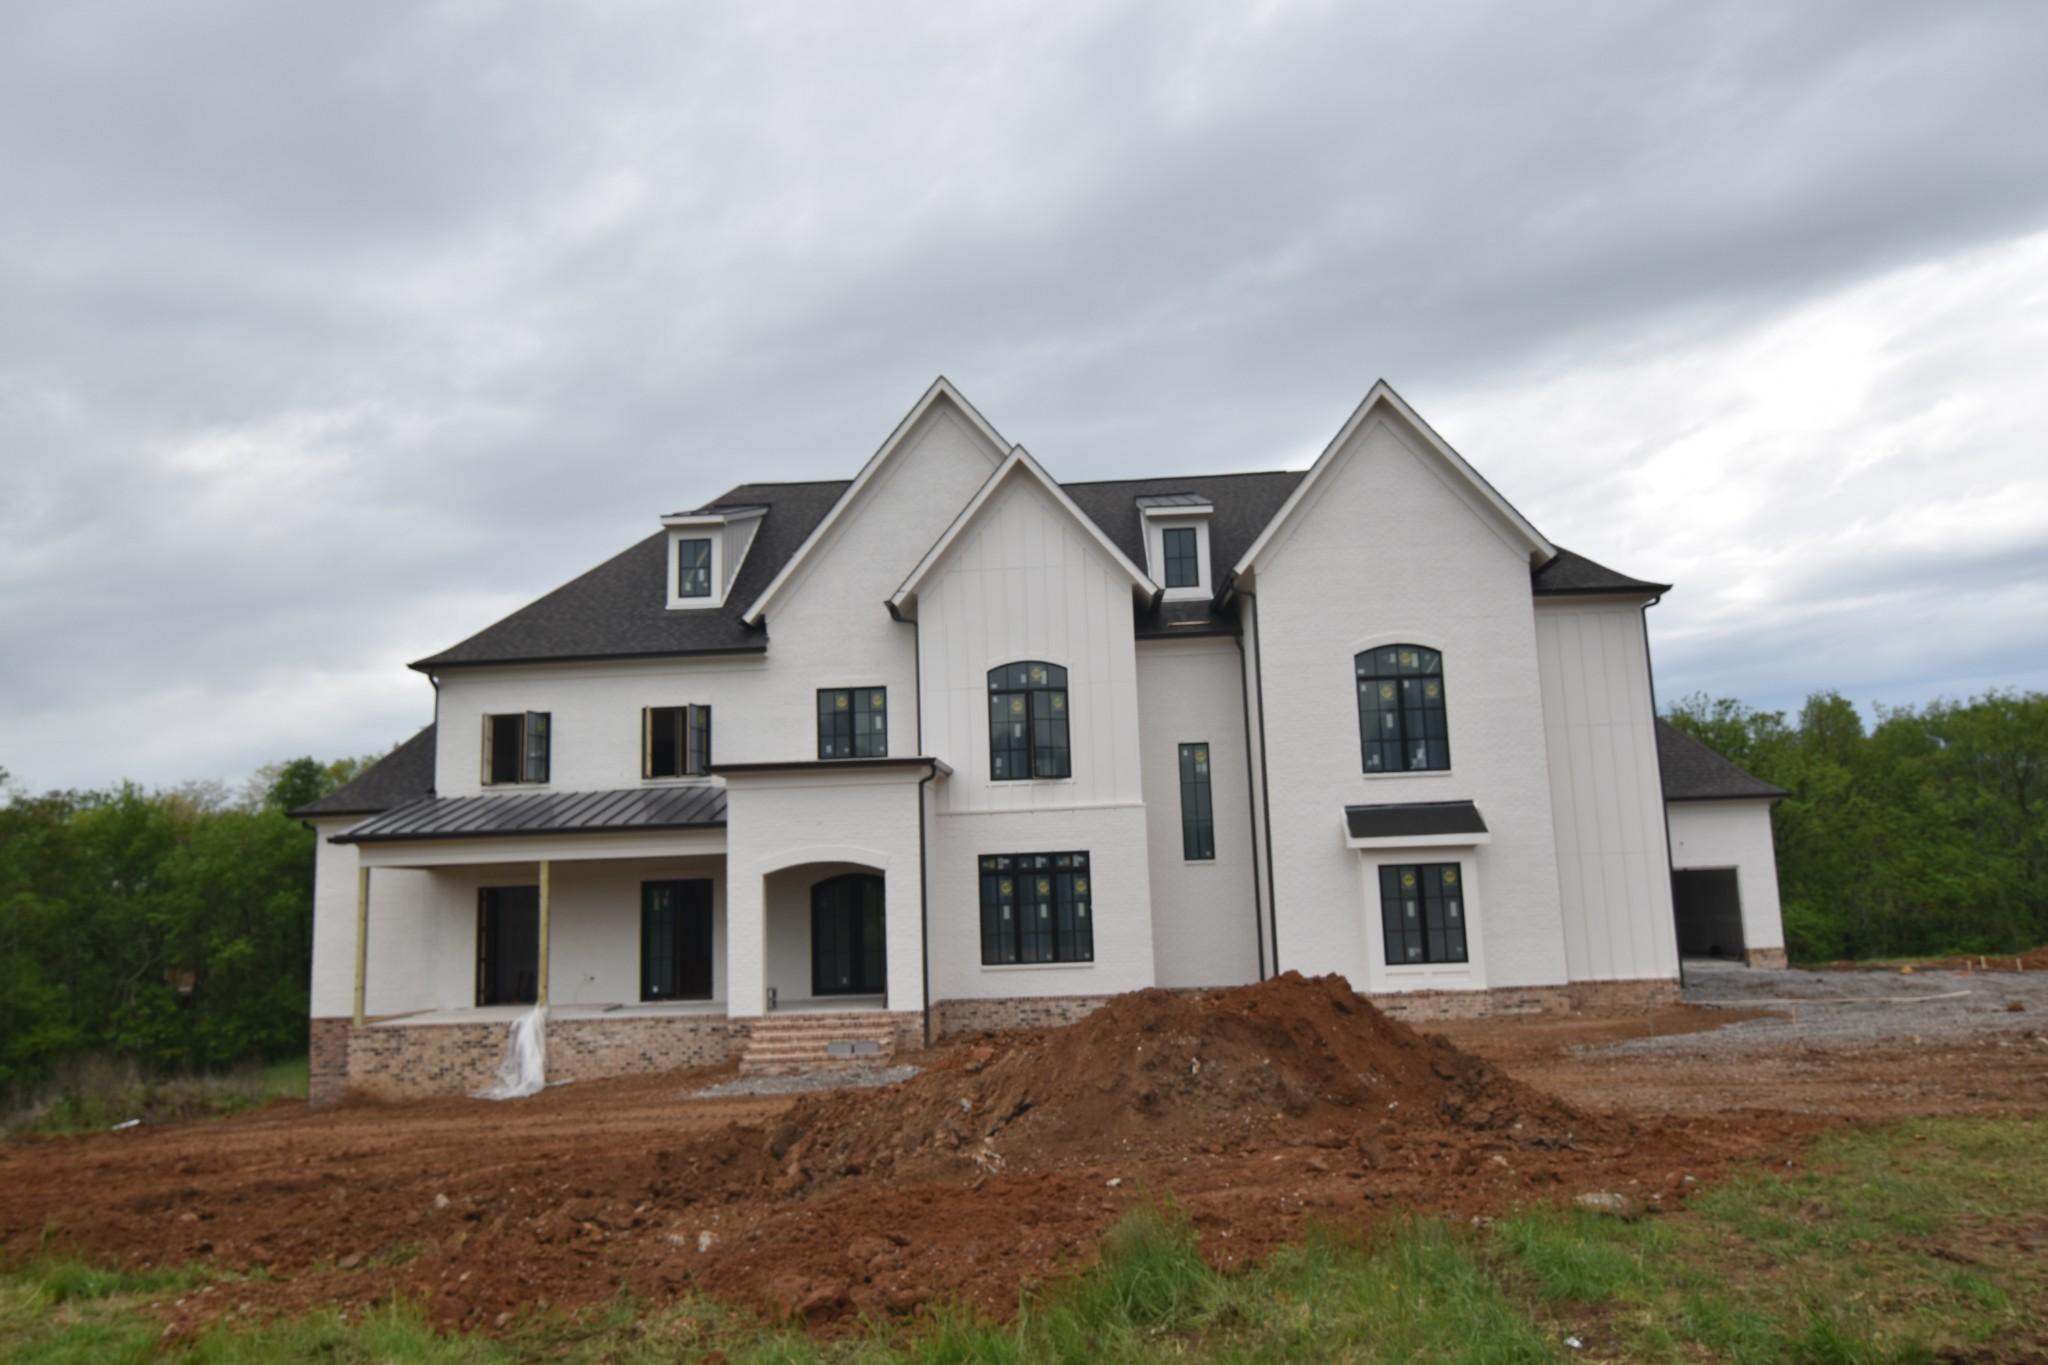 5026 Hilltop Ln, Lot 8, College Grove, TN 37046 - College Grove, TN real estate listing